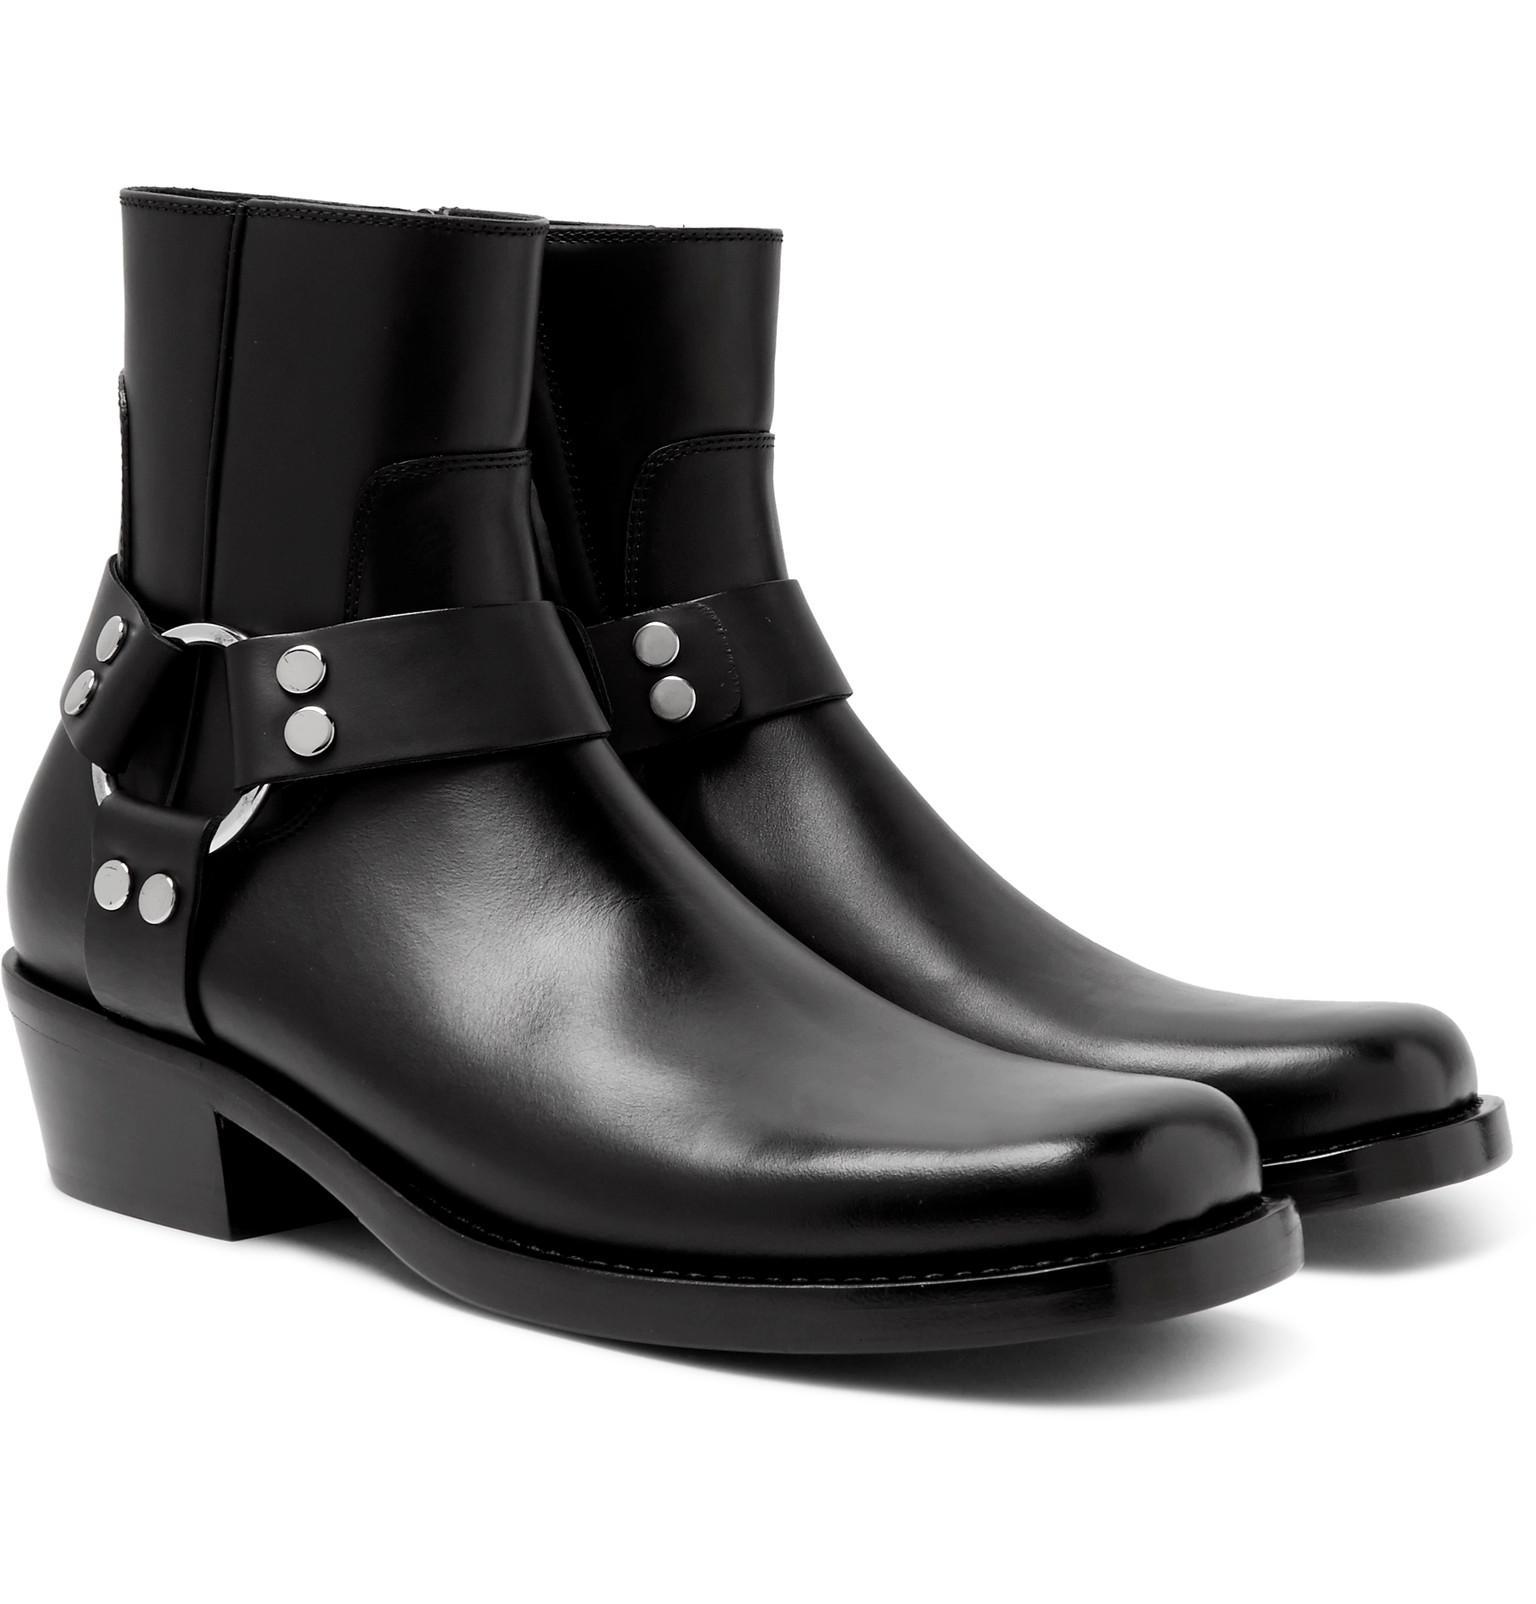 Balenciaga Black Wyatt Harness Boots BDPSK26d